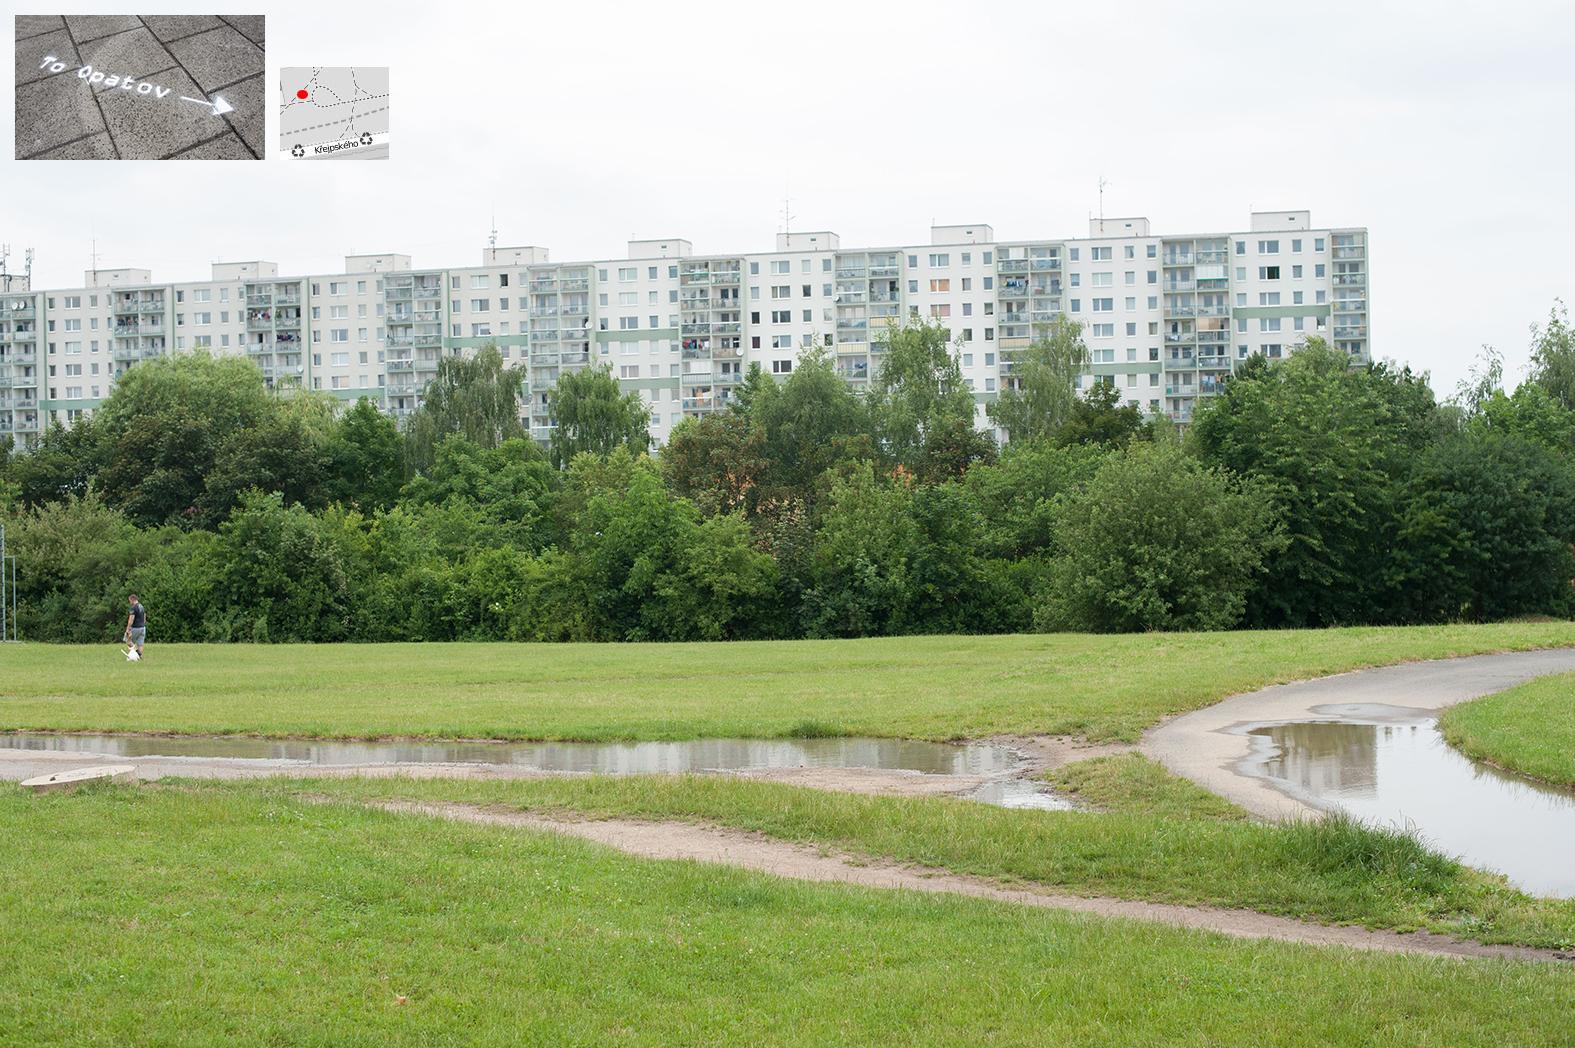 3. Opatov-11